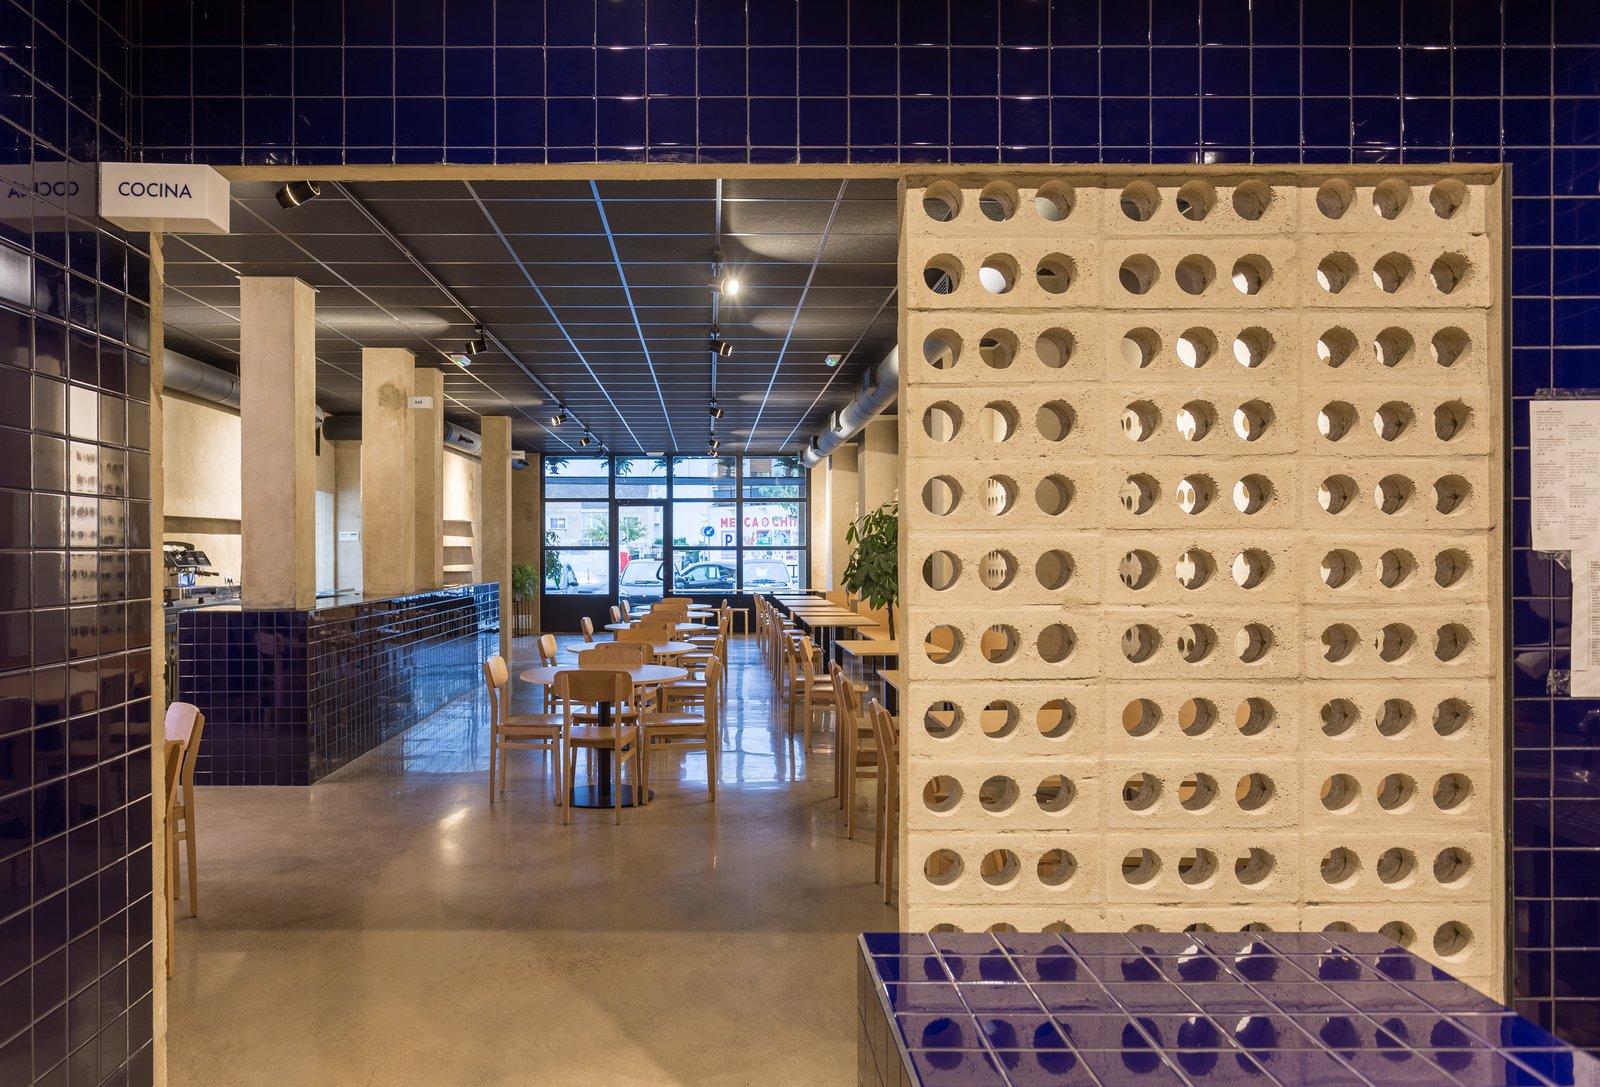 Kitchen, Tile Counter, Concrete Floor, Ceramic Tile Backsplashe, Accent Lighting, Ceramic Tile Floor, Wall Lighting, Ceiling Lighting, and Track Lighting The latticework suggests transparencies from the kitchen.  IMOOD Restaurant